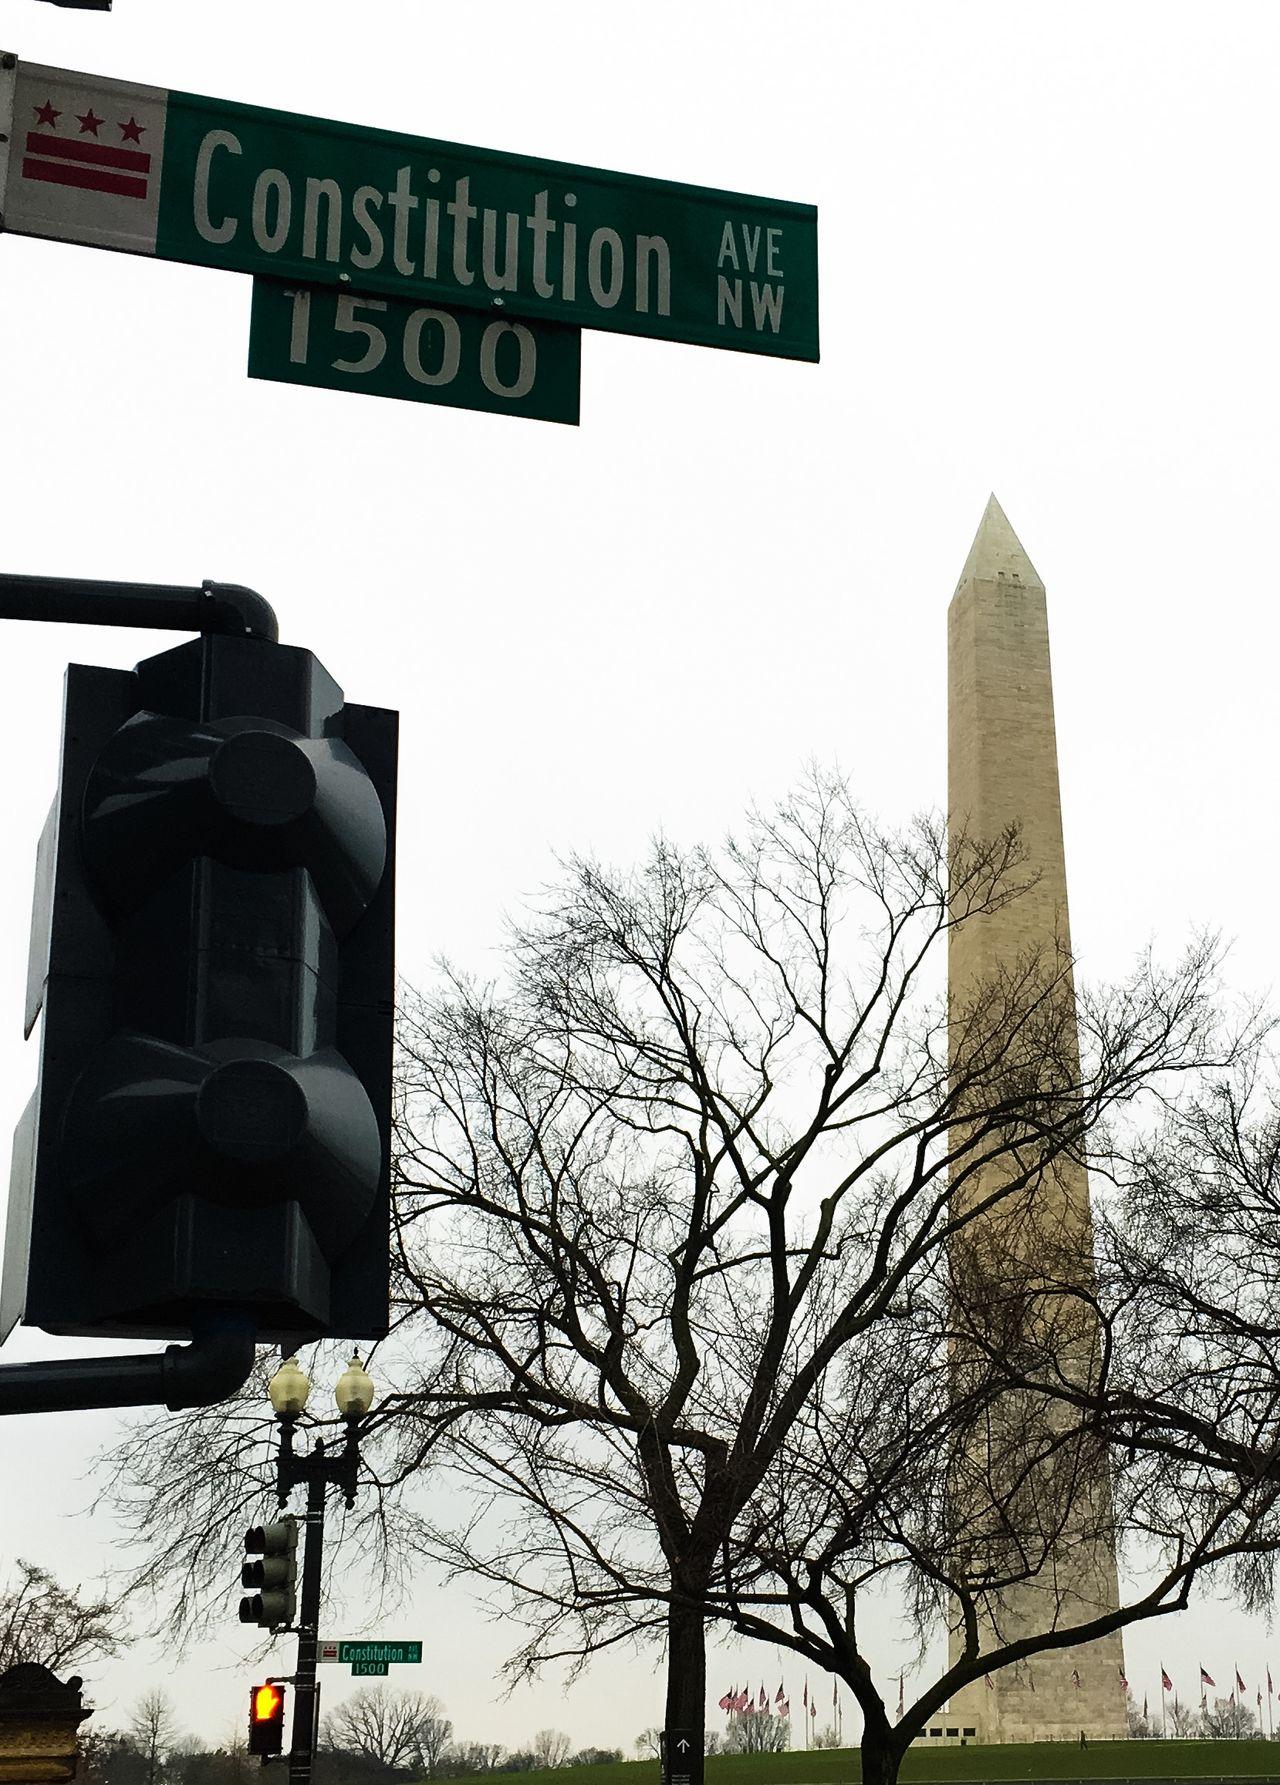 Travel Photography Washington, D. C. USA Constitution Avenue Washington Monument Tree Branches